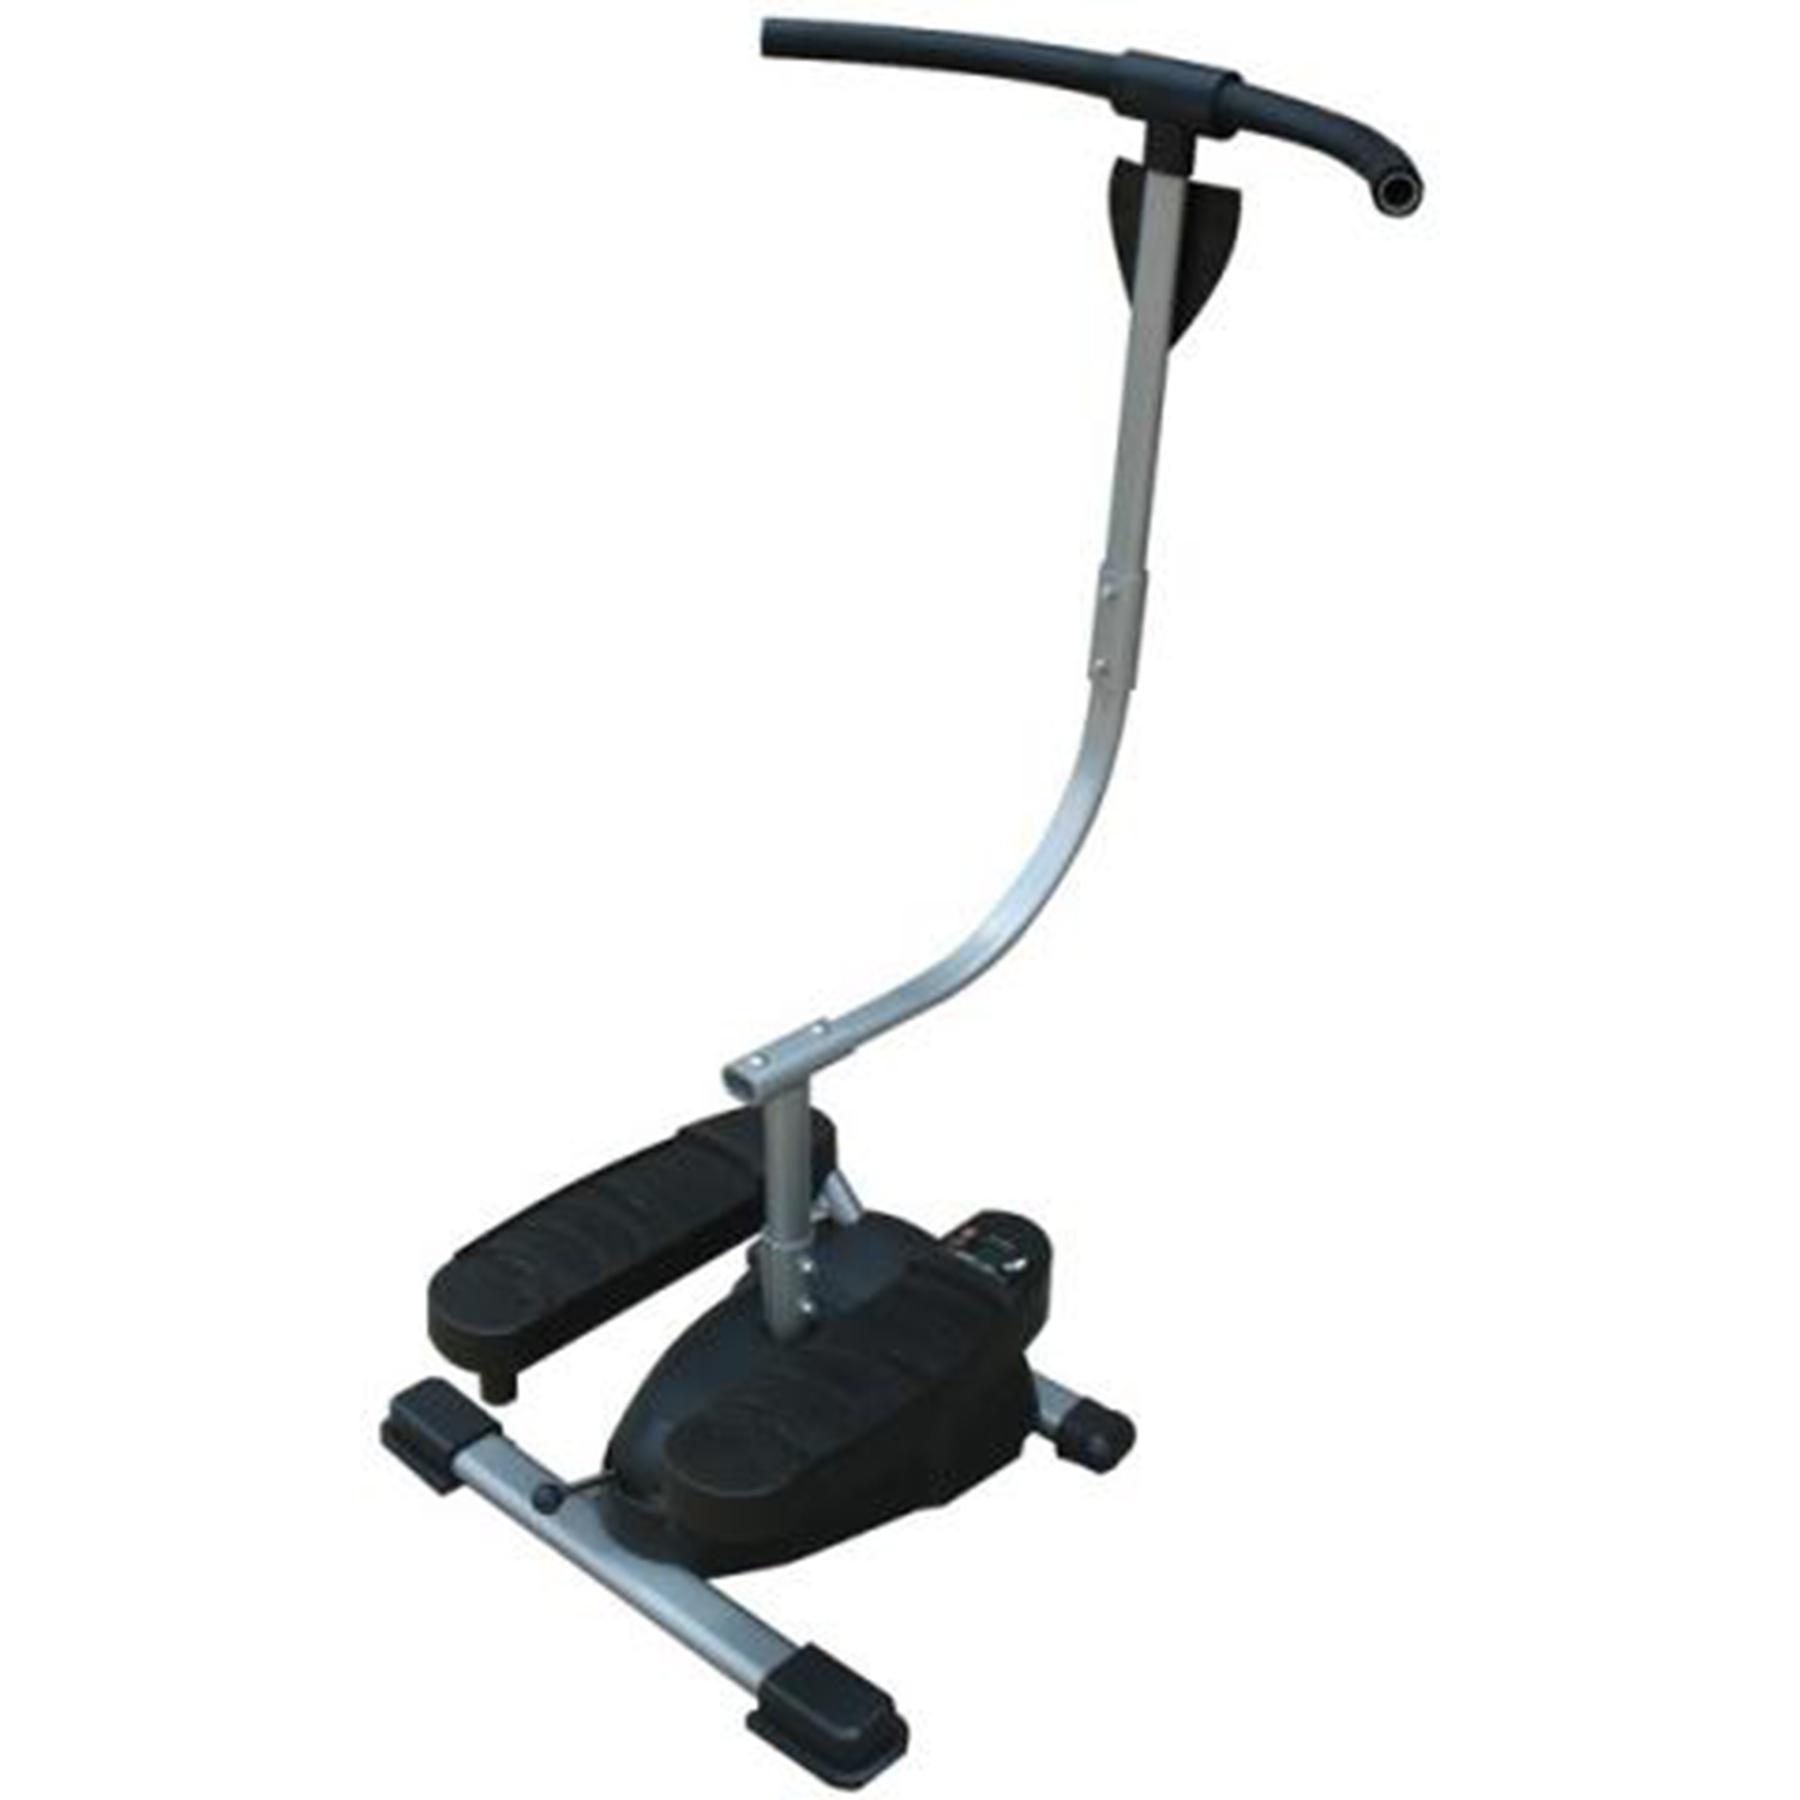 Степпер Cardio Twister  SE 5110 *  УЦЕНКА!!! РАСПРОДАЖА!!!